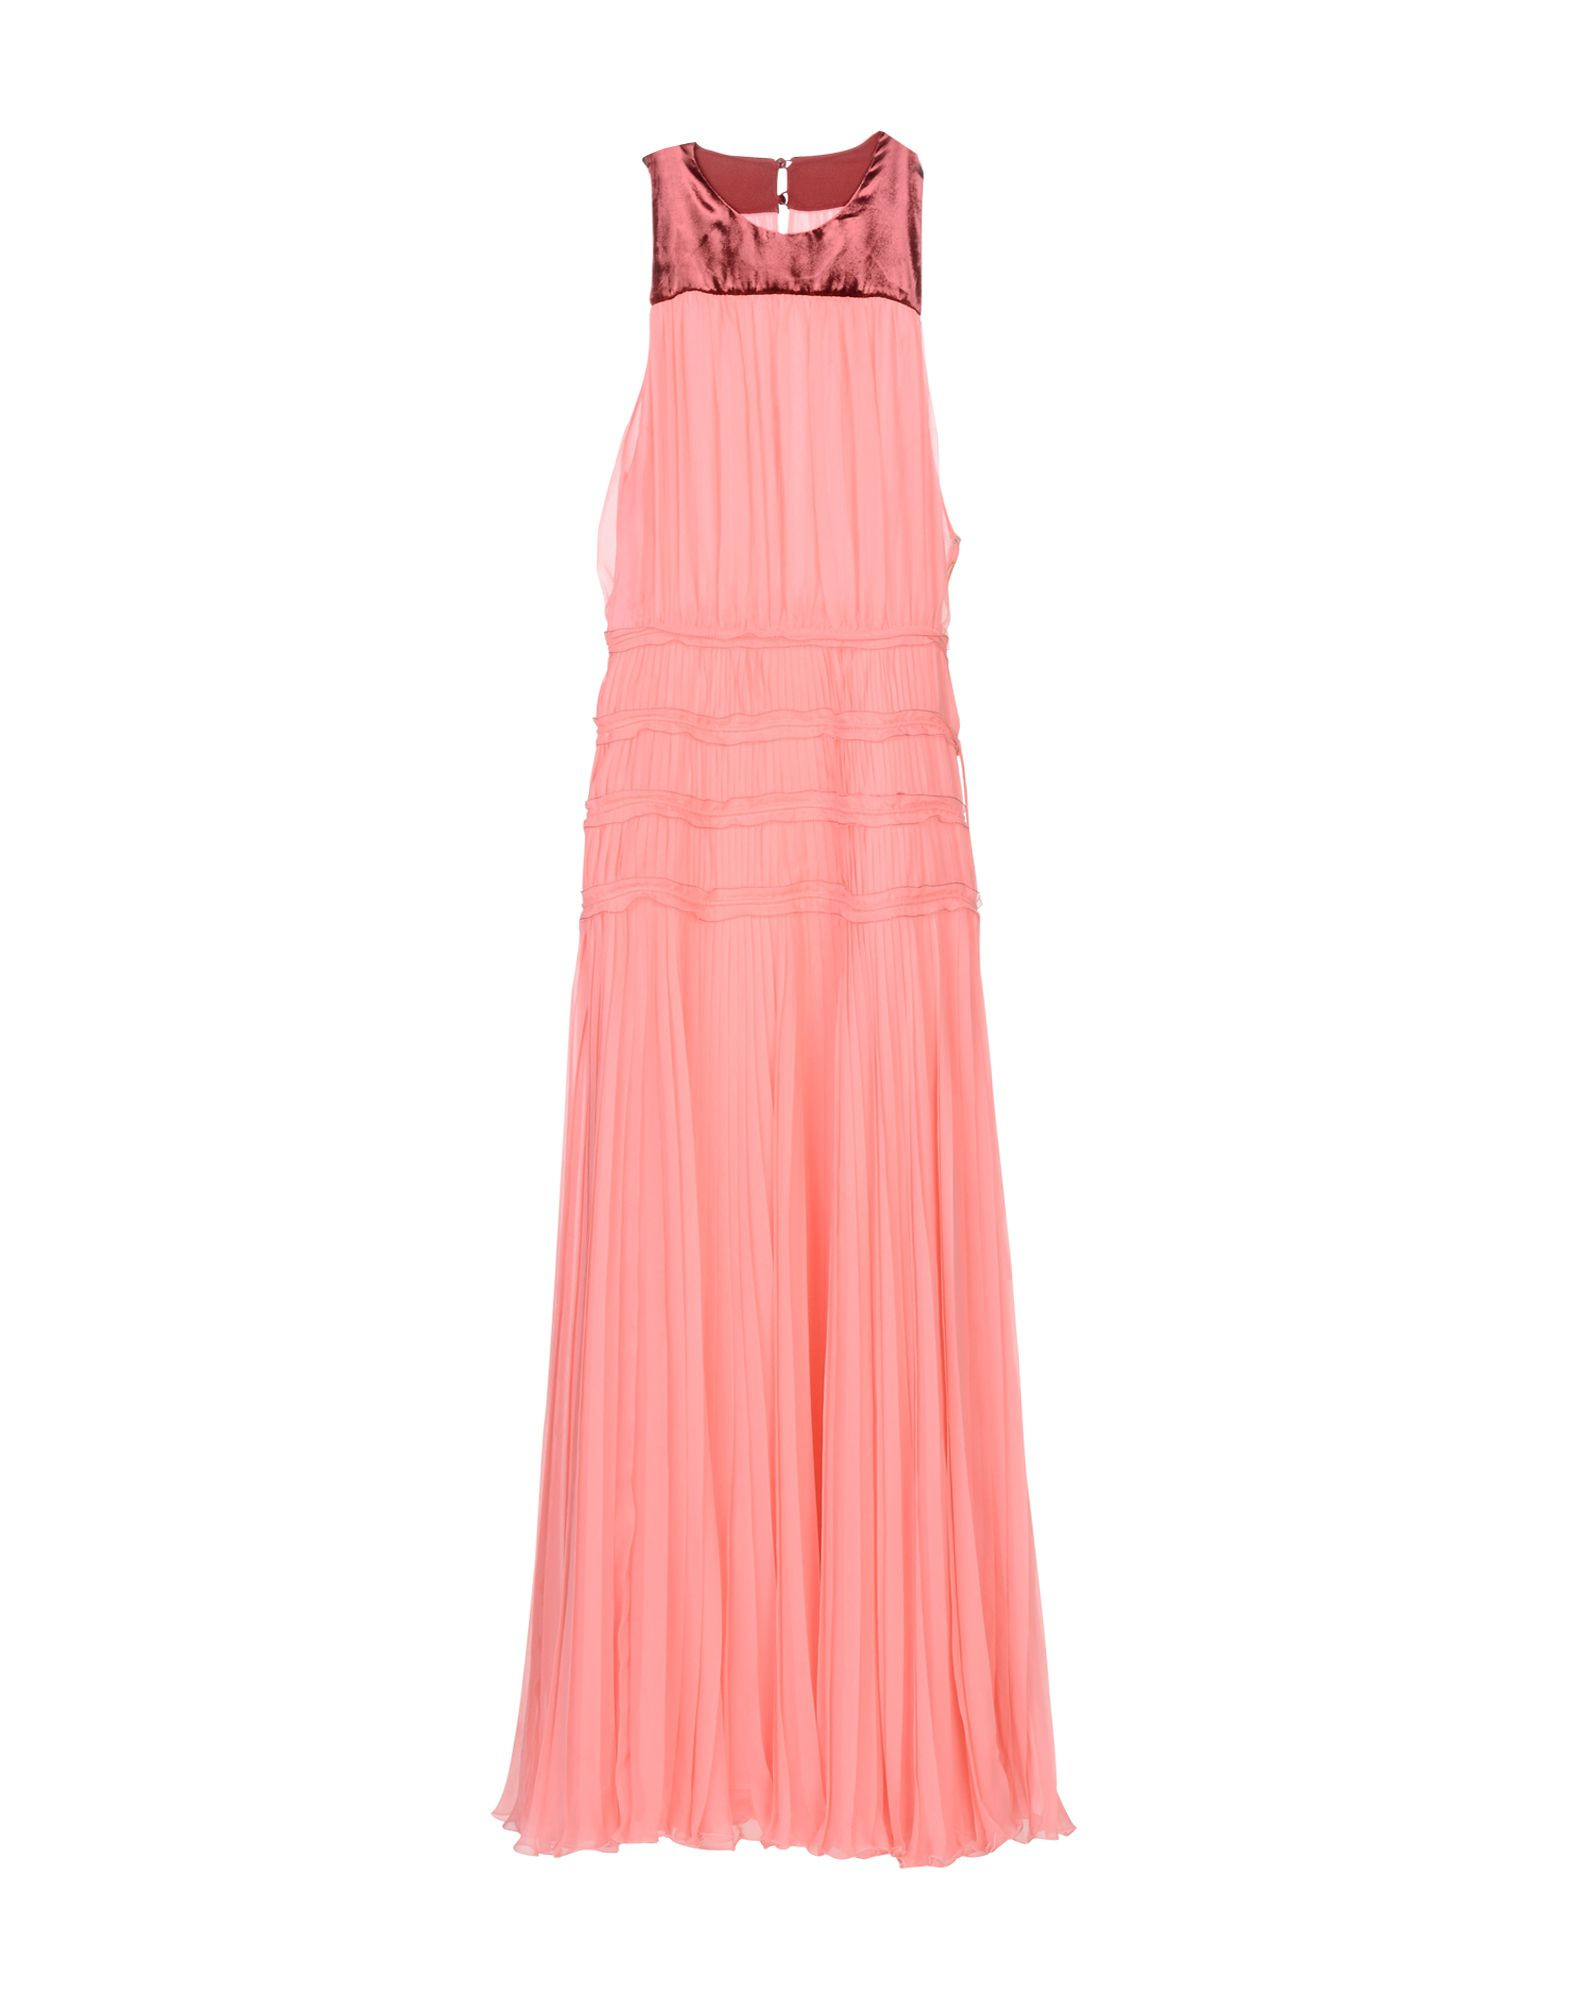 17 Wunderbar Abendkleider Yoox StylishFormal Großartig Abendkleider Yoox Vertrieb